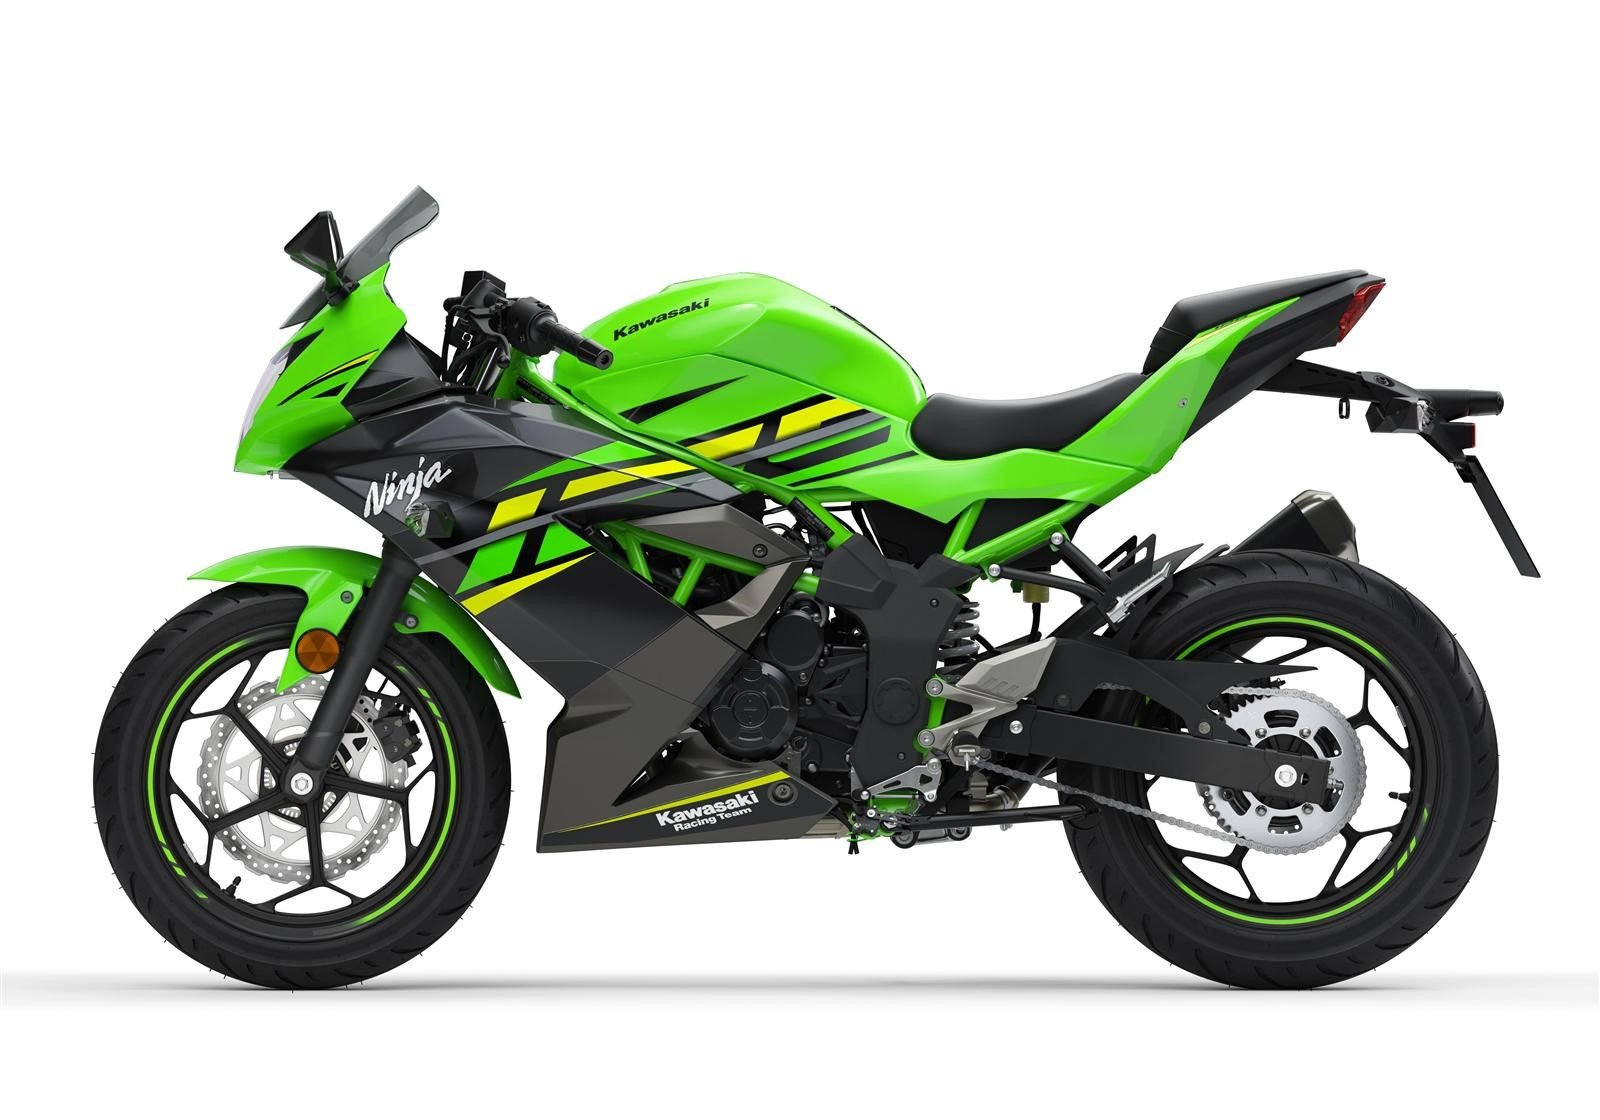 New 2019 Kawasaki Ninja 125 ABS KRT**SAVE £800!!** For Sale (picture 4 of 6)